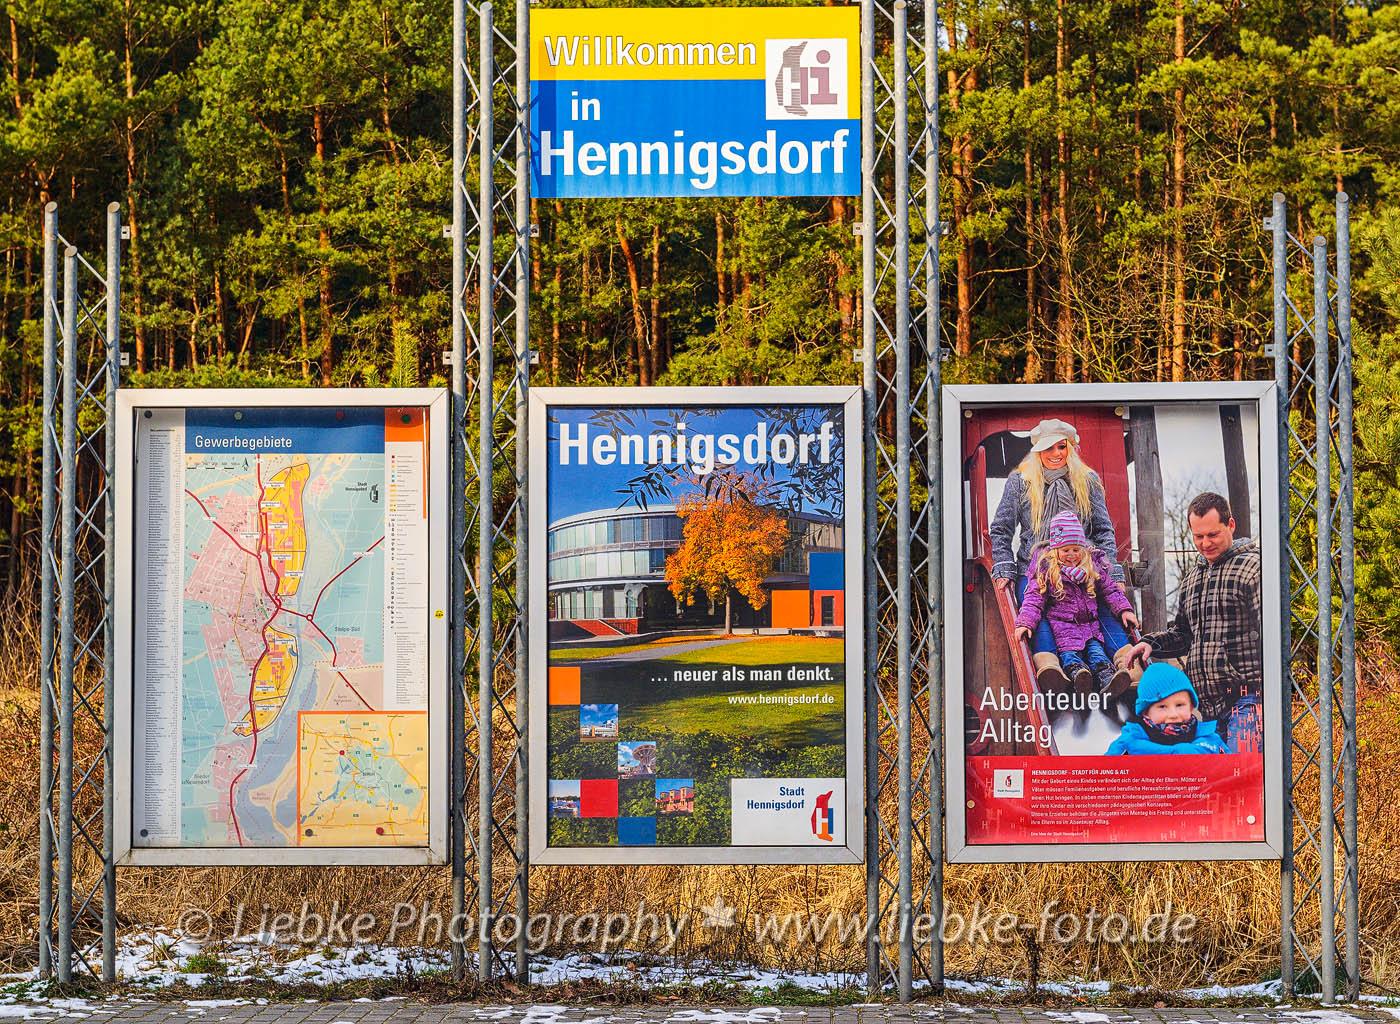 Großbildkampagne Stadtwerbung Hennigsdorf